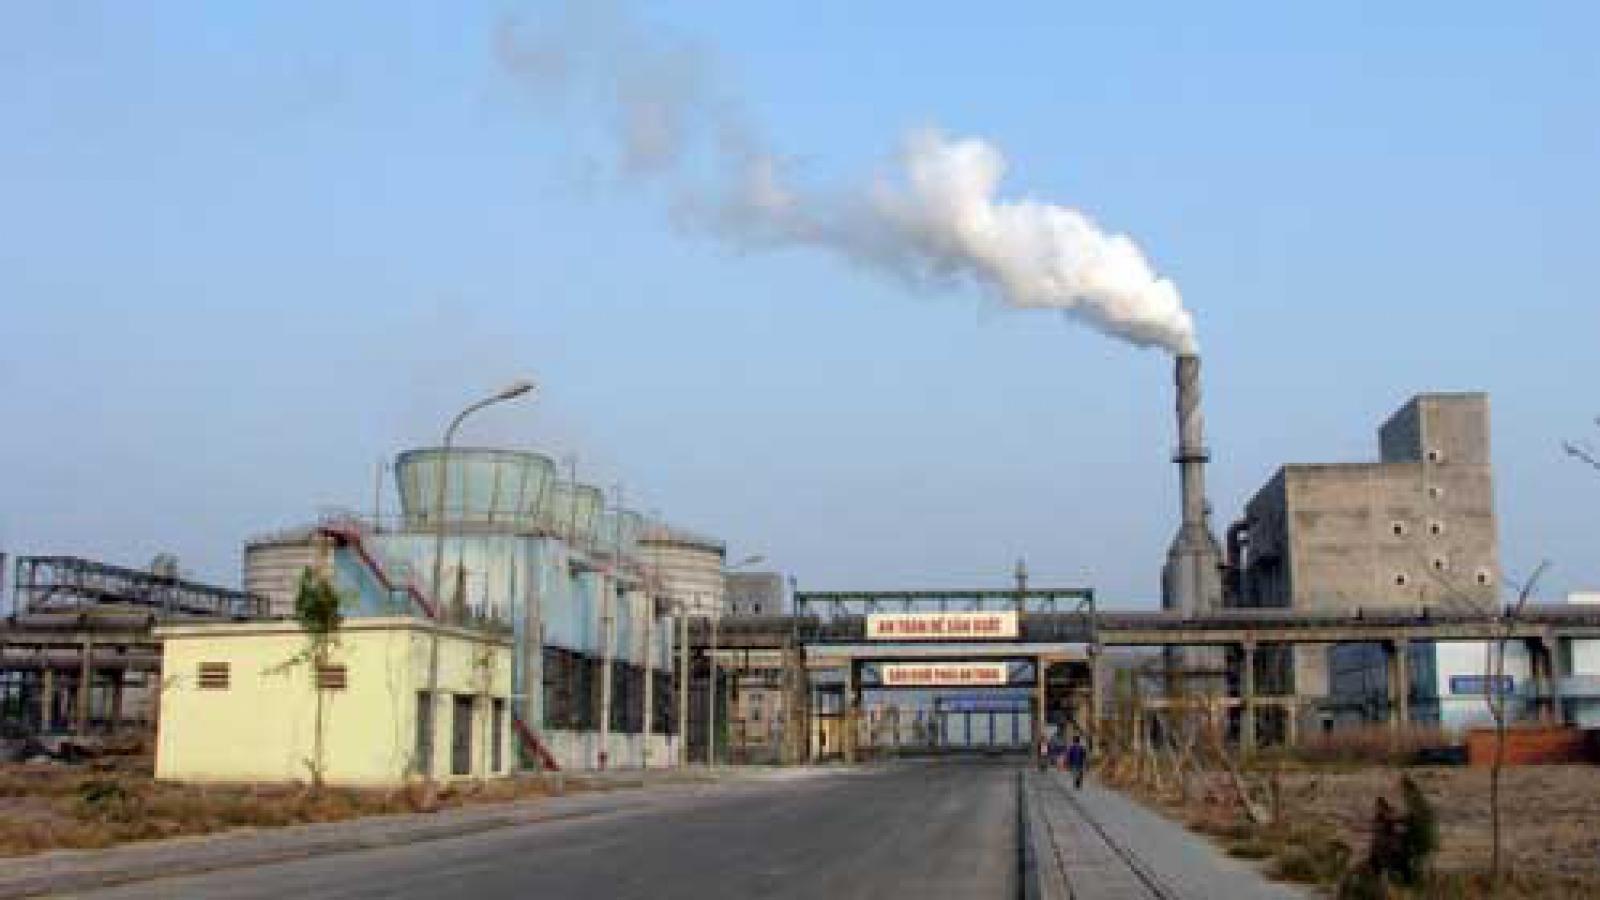 Local-foreign consortium to develop fertilizer complex